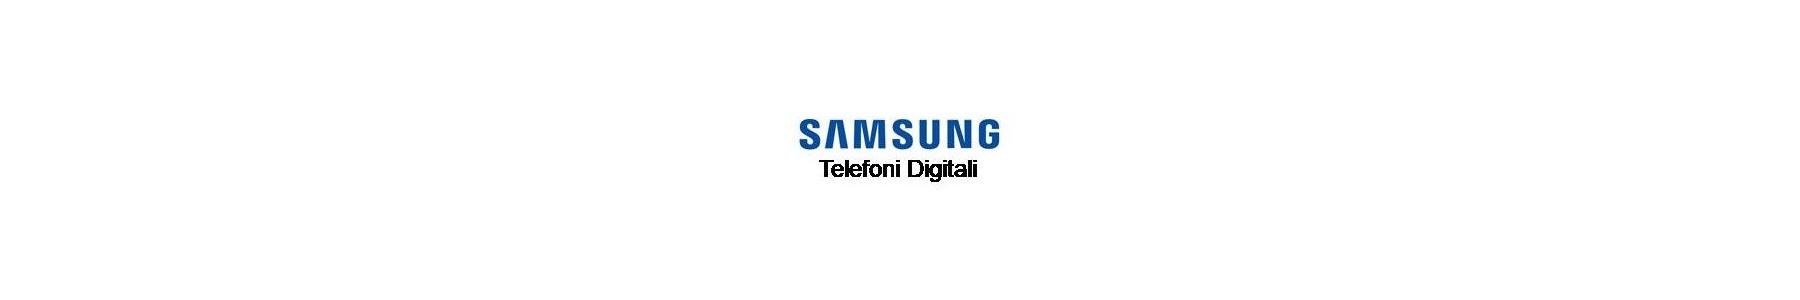 Telefoni Digitali Samsung